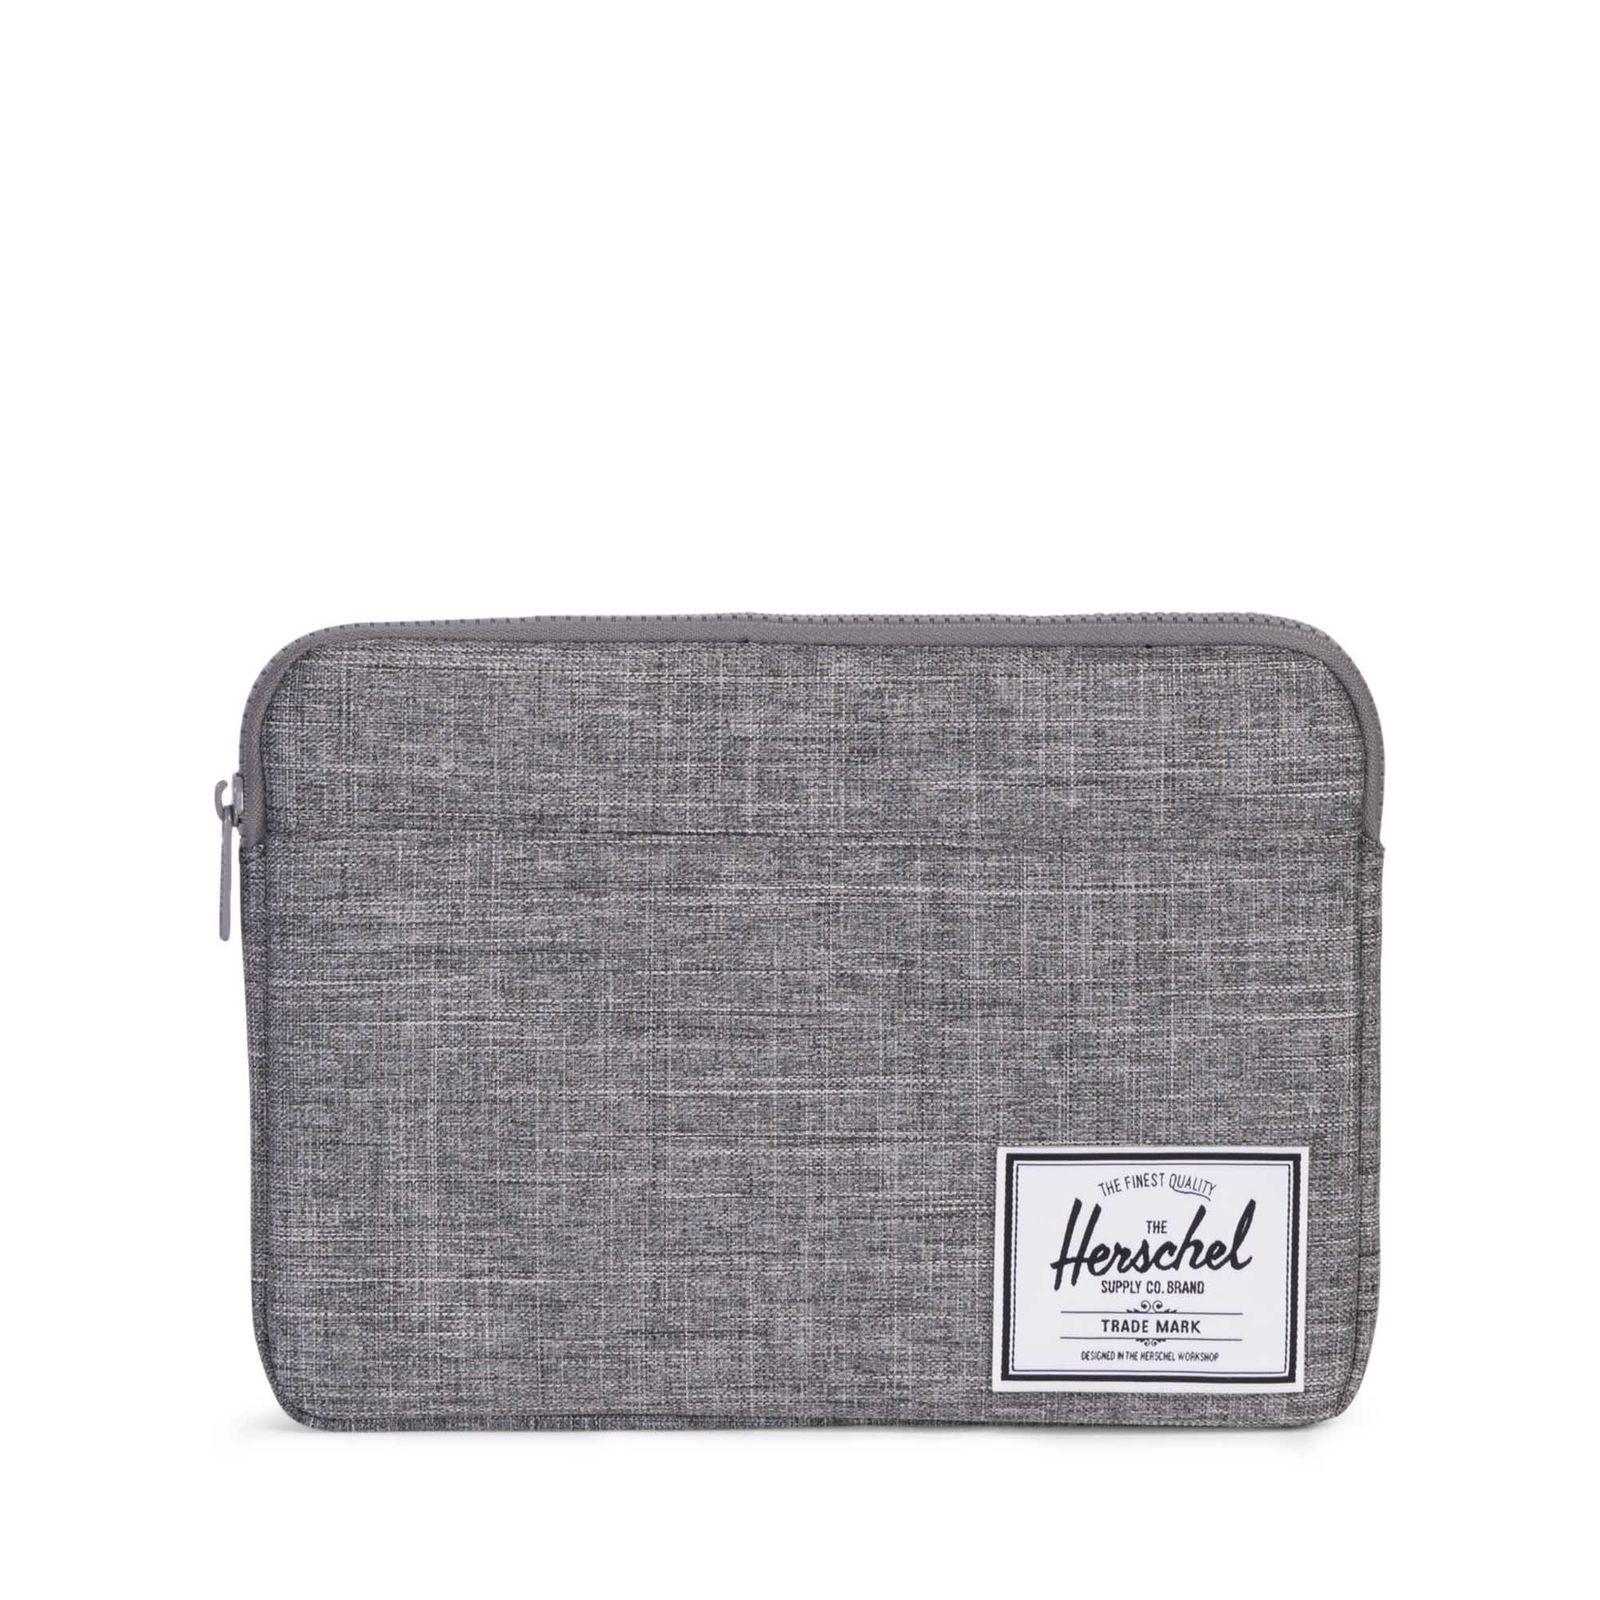 Herschel iPad Kılıfı Anchor Sleeve for iPad Air Raven Crosshatch